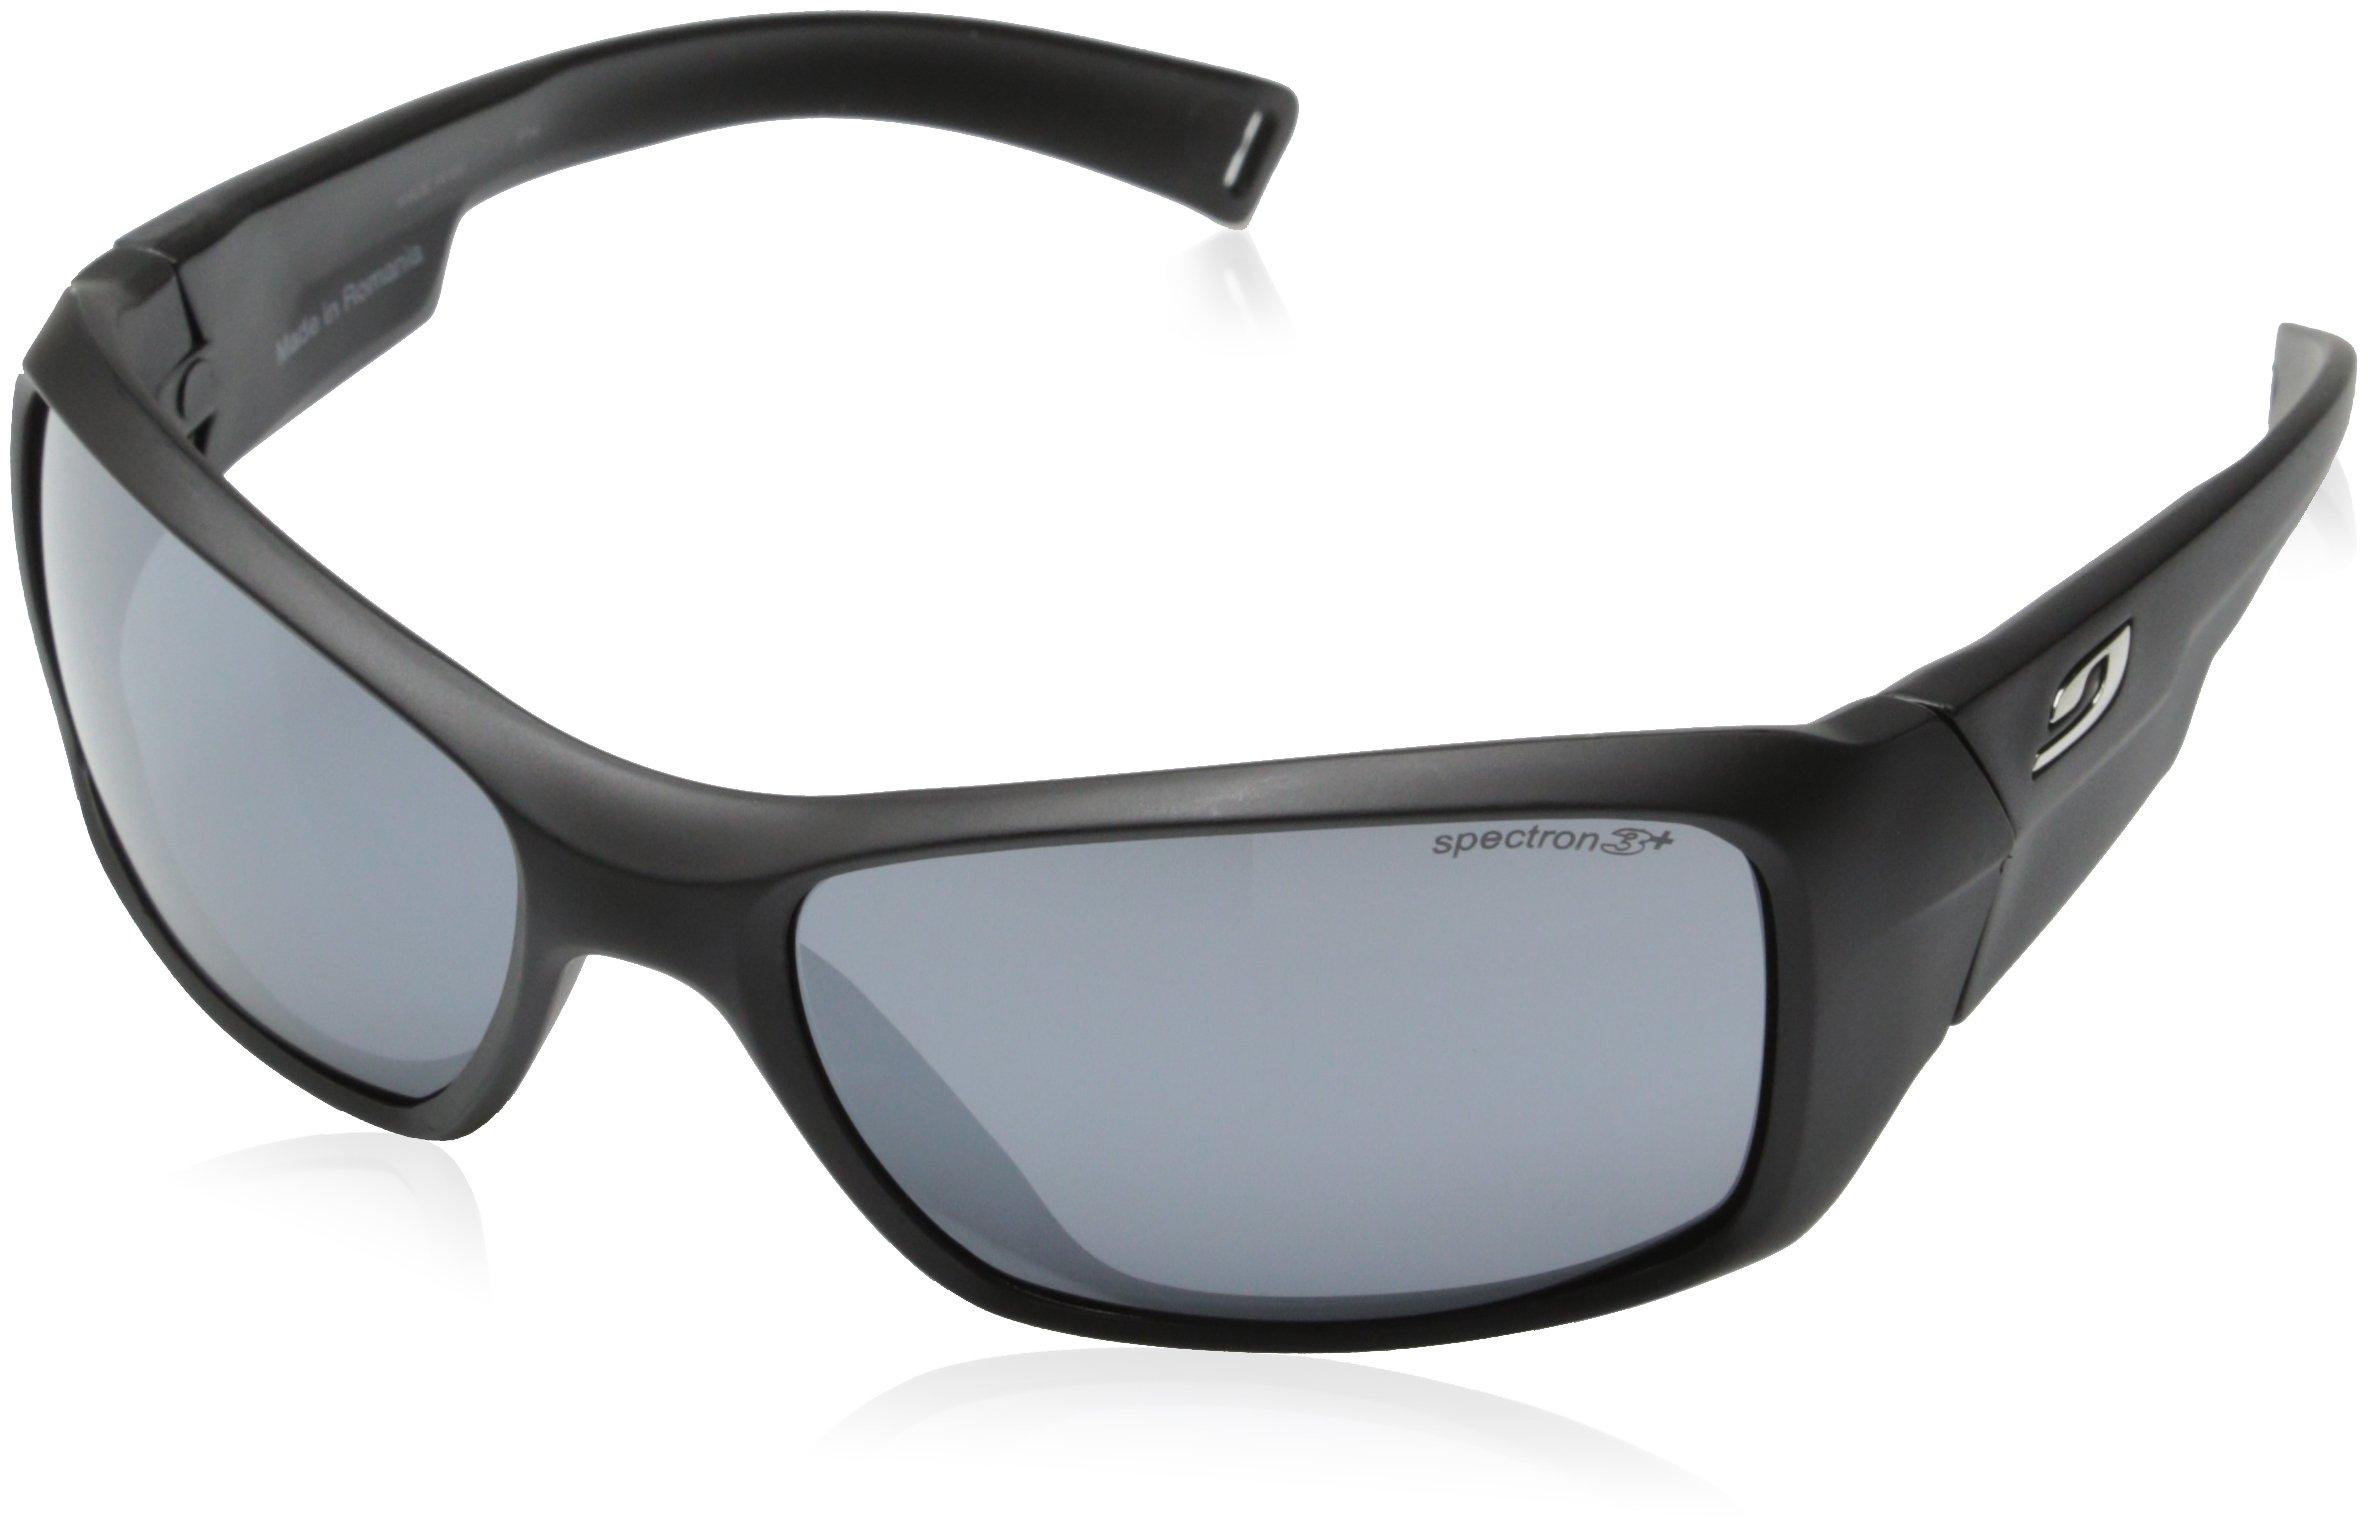 Julbo Kid's Rookie Sunglasses with Spectron 3+ Lens, Matt Black, 8-12 Years